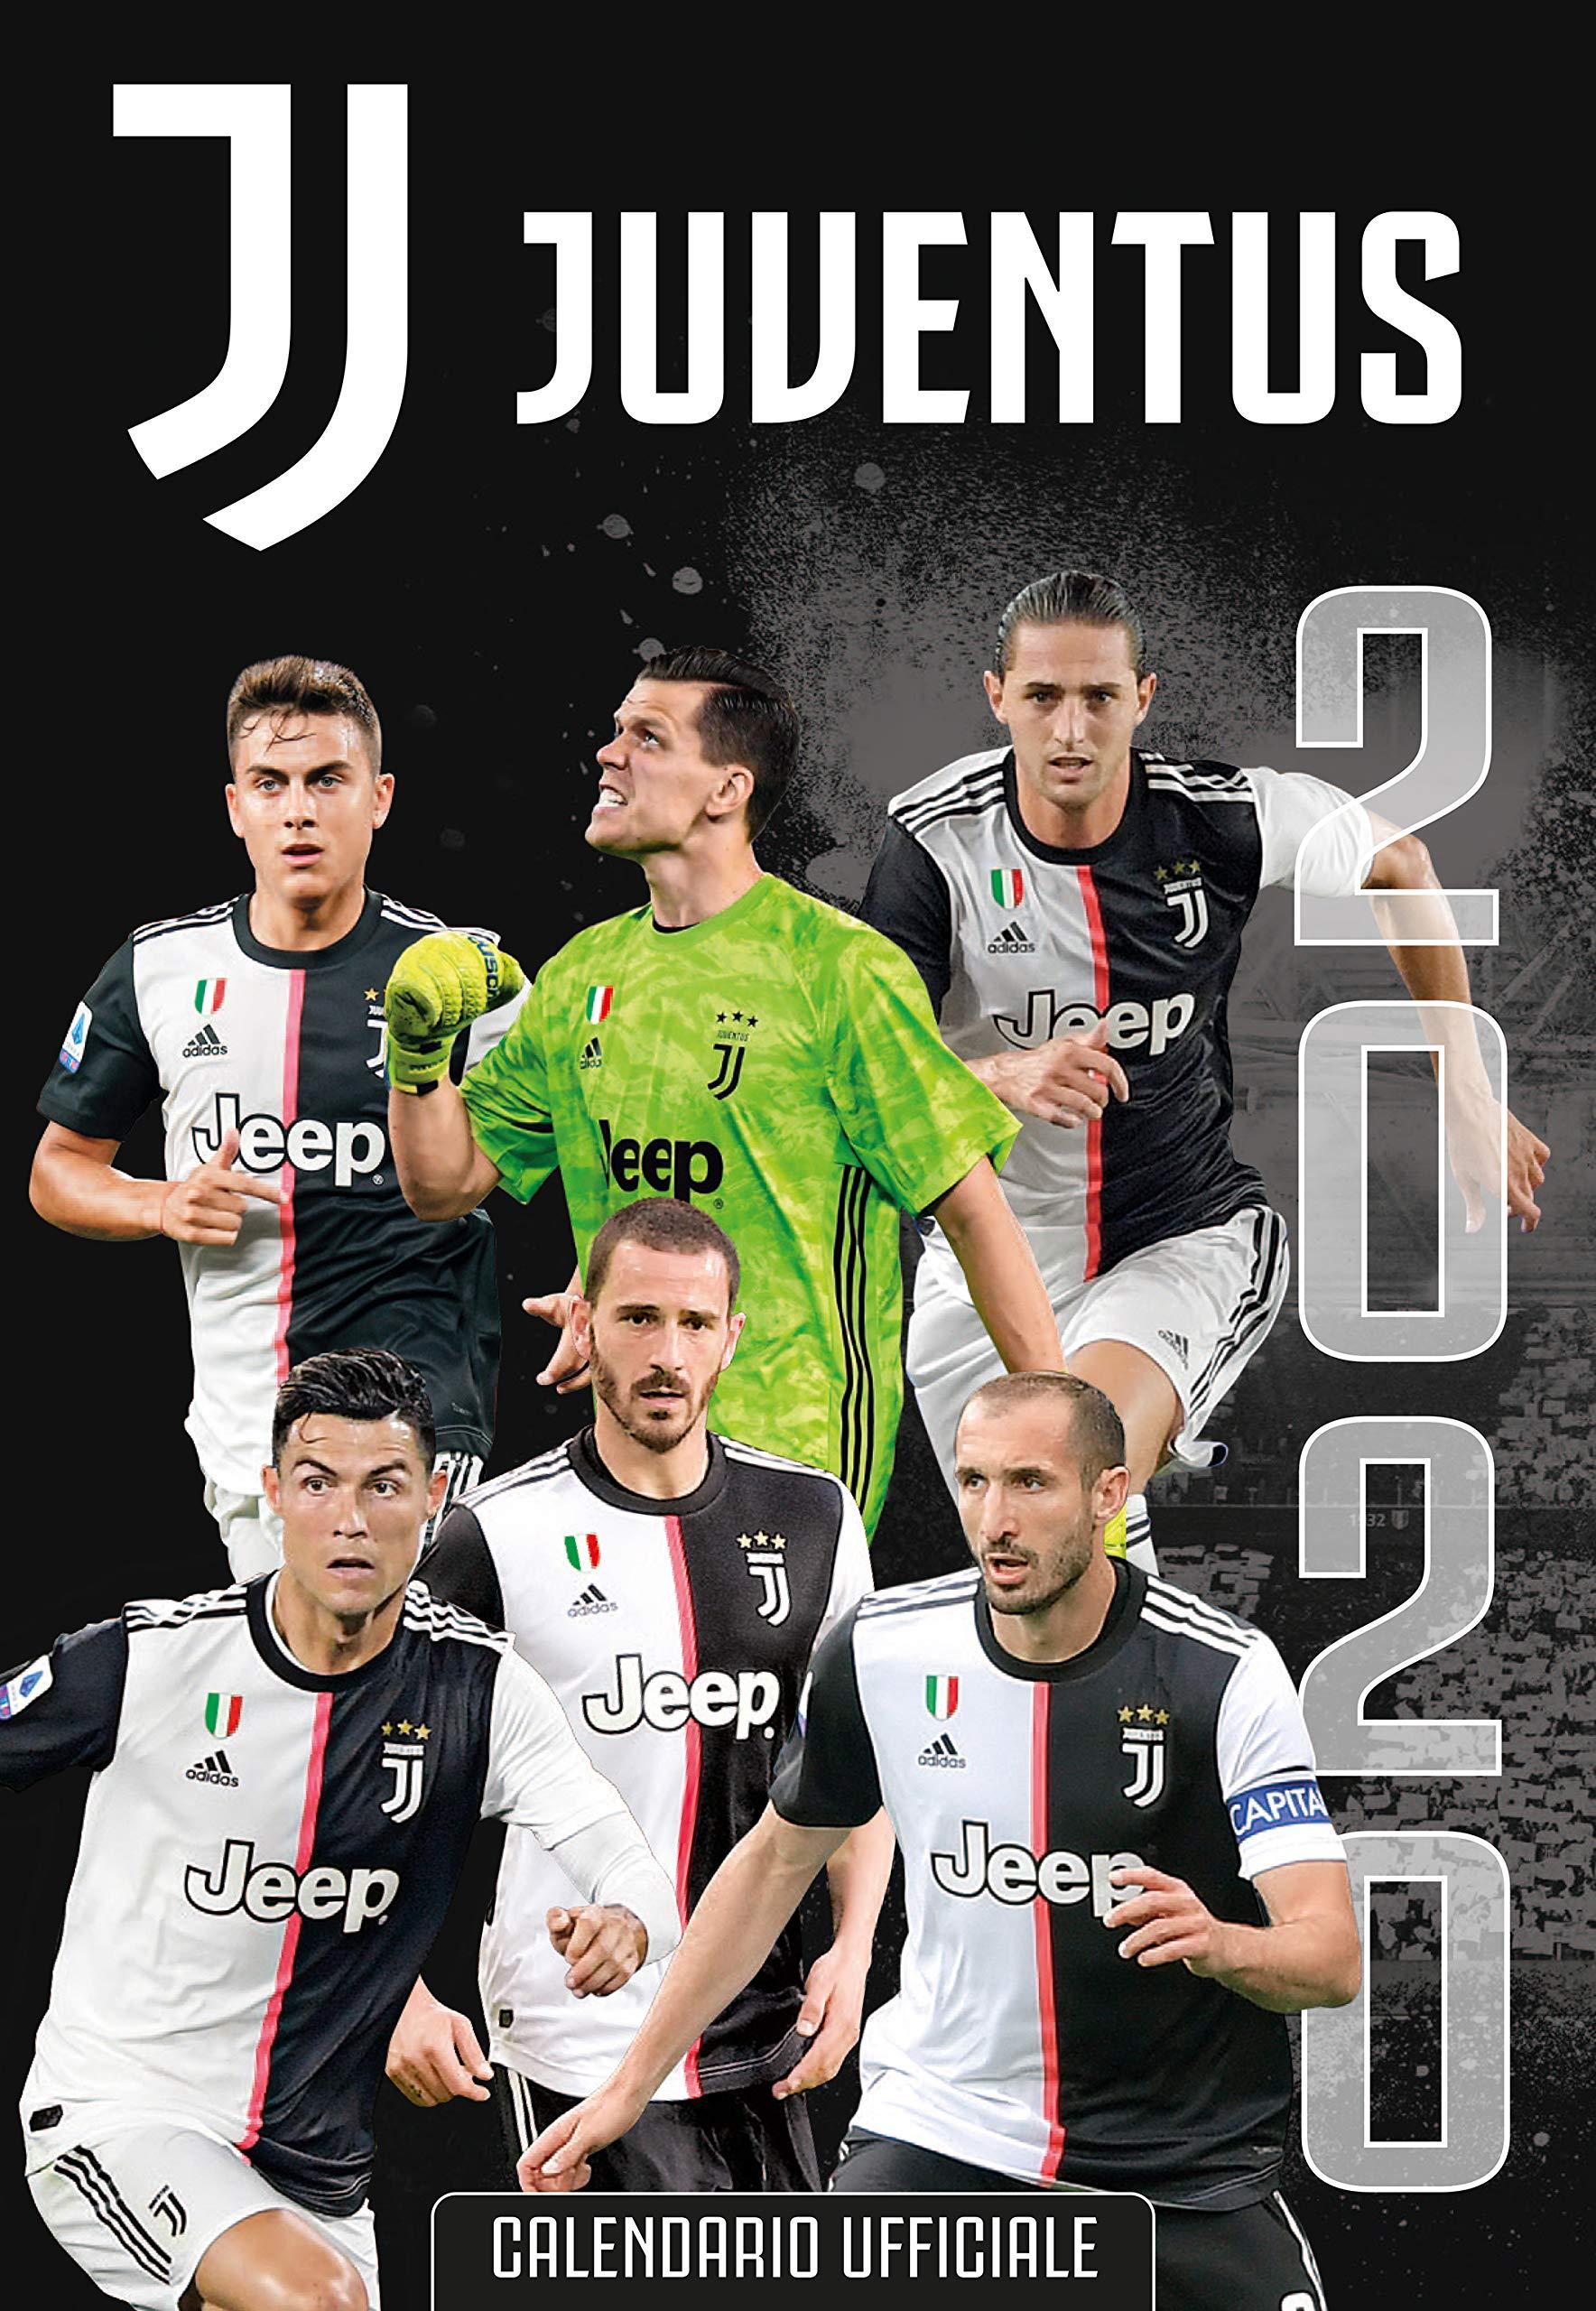 mondo 13720 Leather Football Juventus F.C.